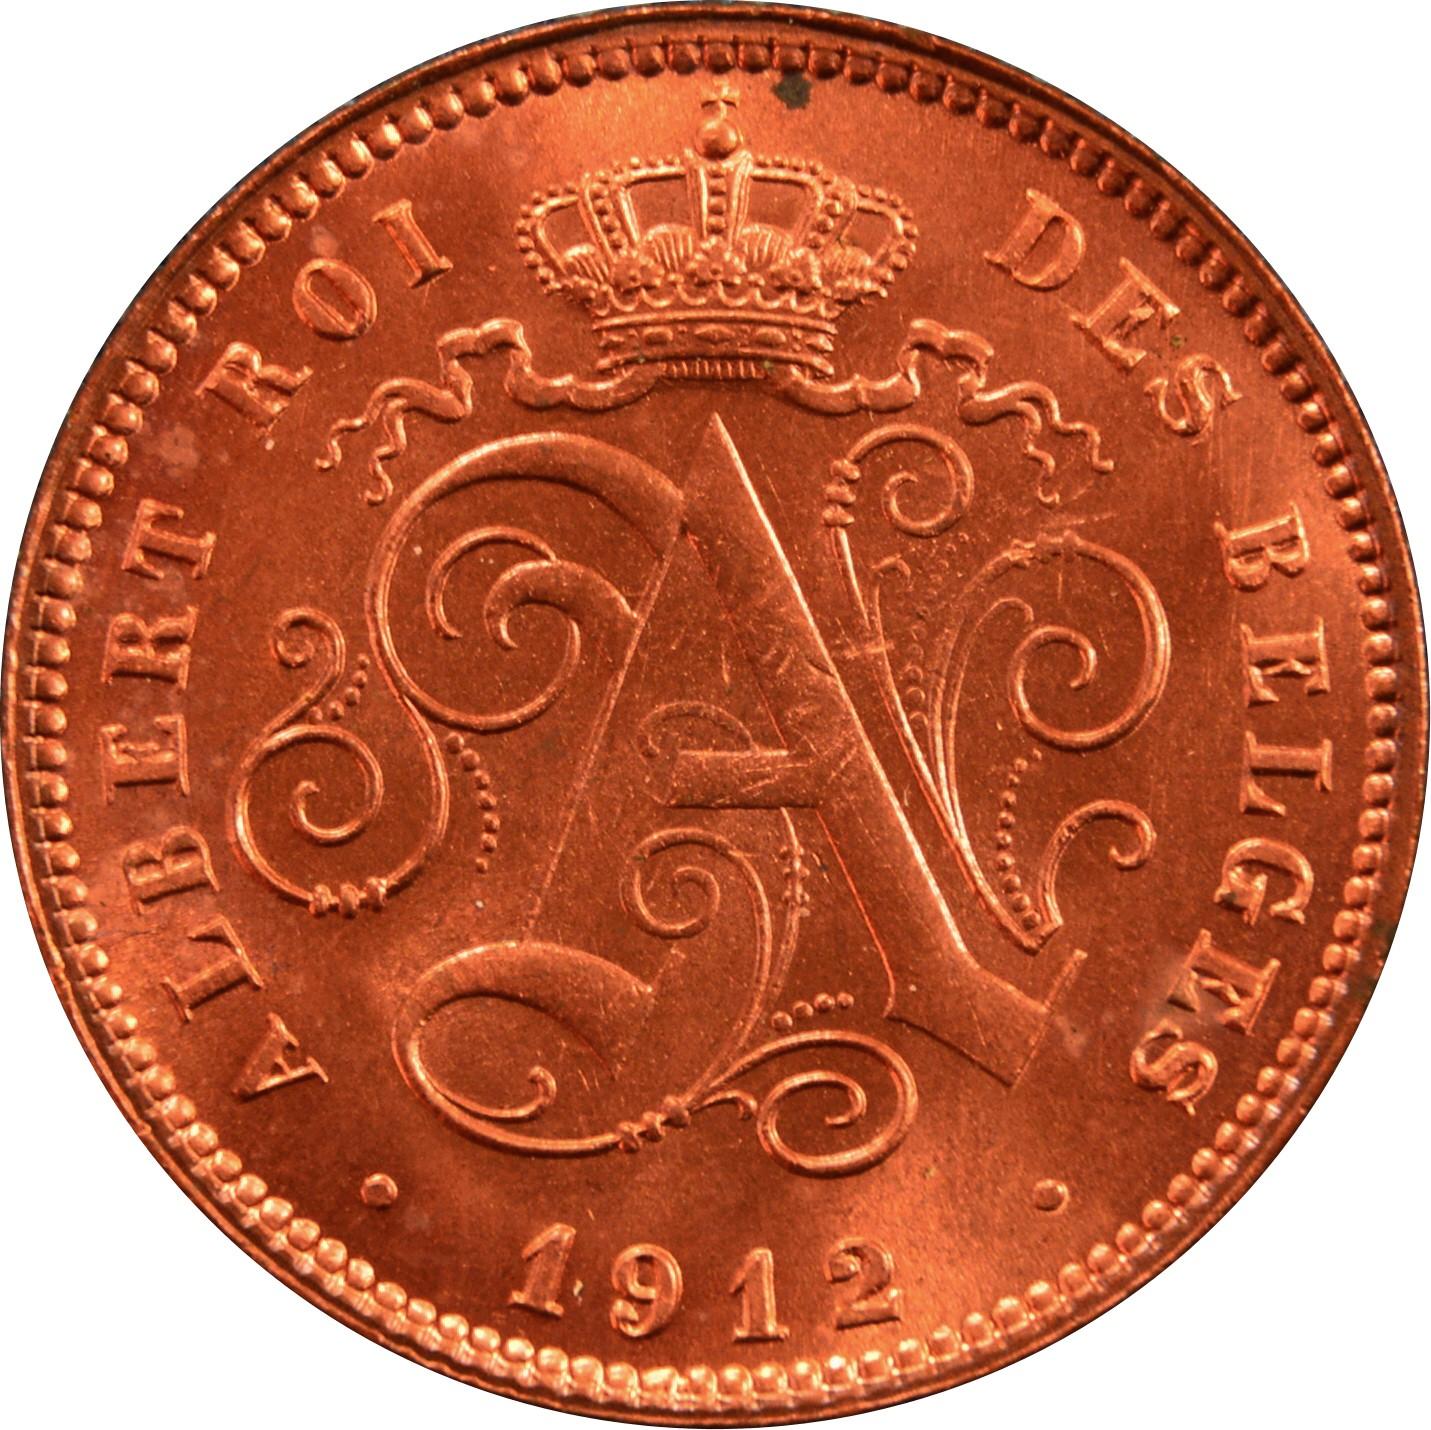 Belgium 2 Centimes (1911-1919 Albert I-French text)